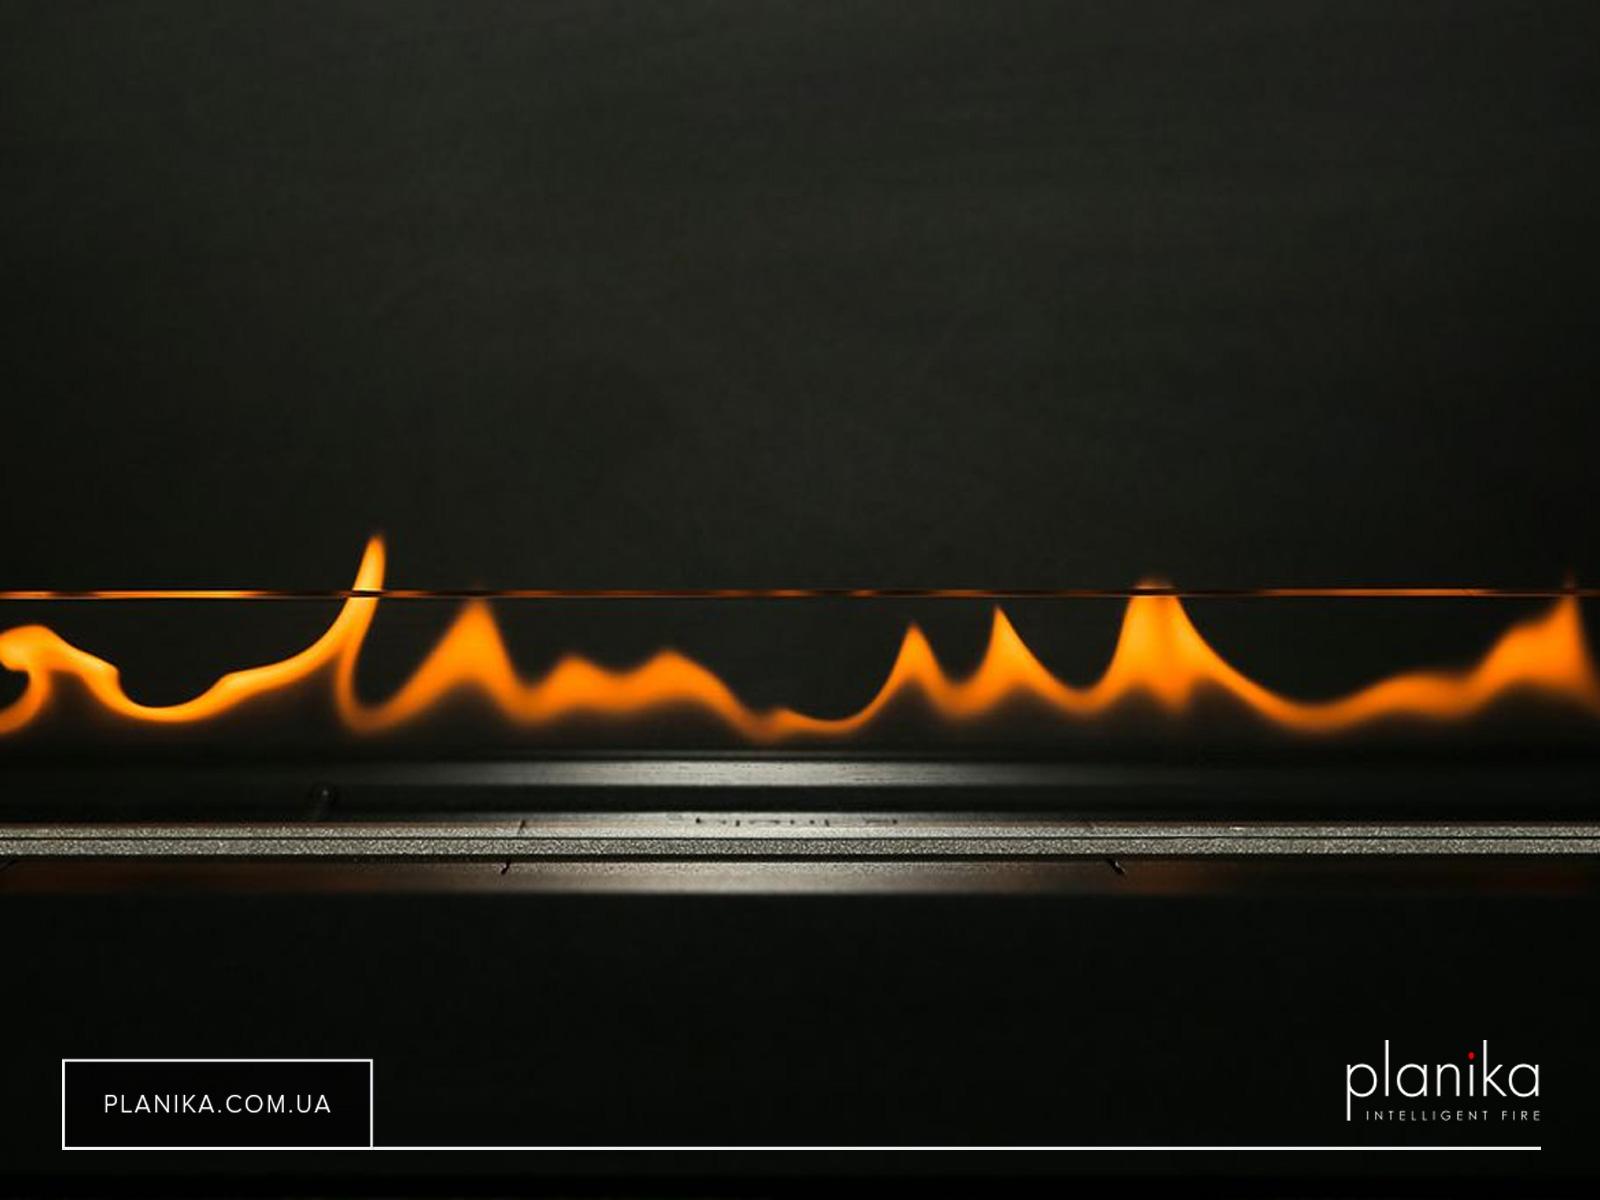 Planika FLA 2 MODEL E in CASING ЖК Тетрис-Холл